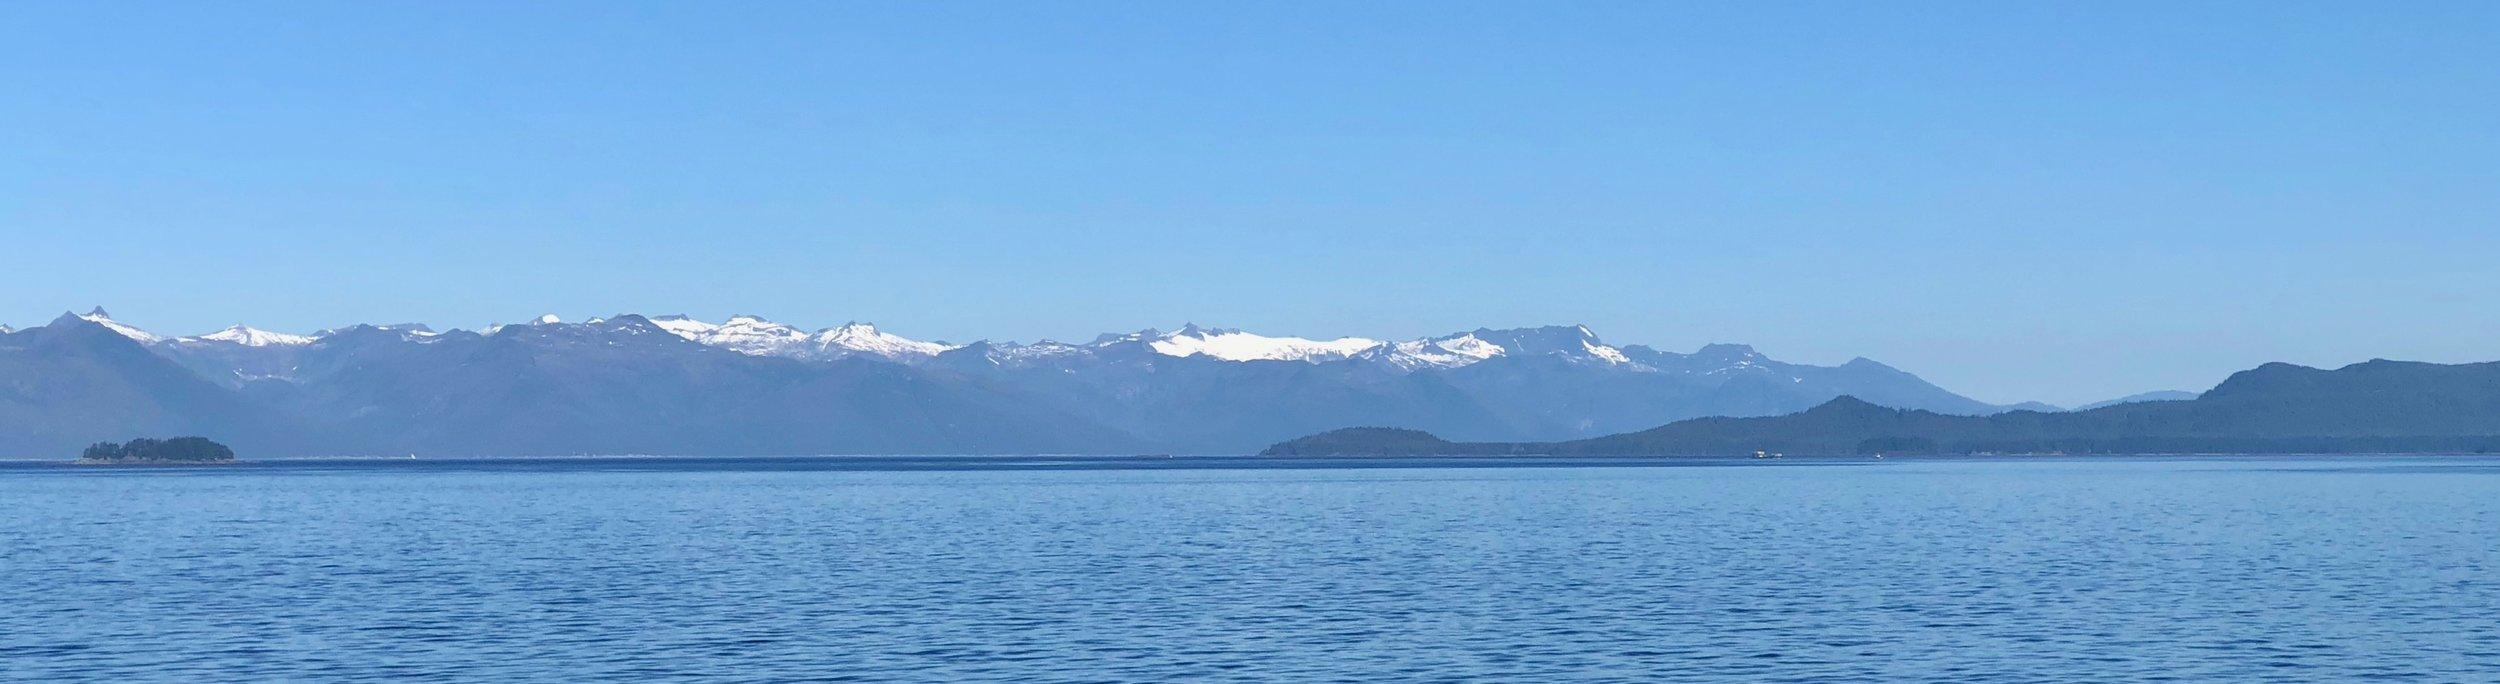 Alaska Day 1 Panos - 5.jpg